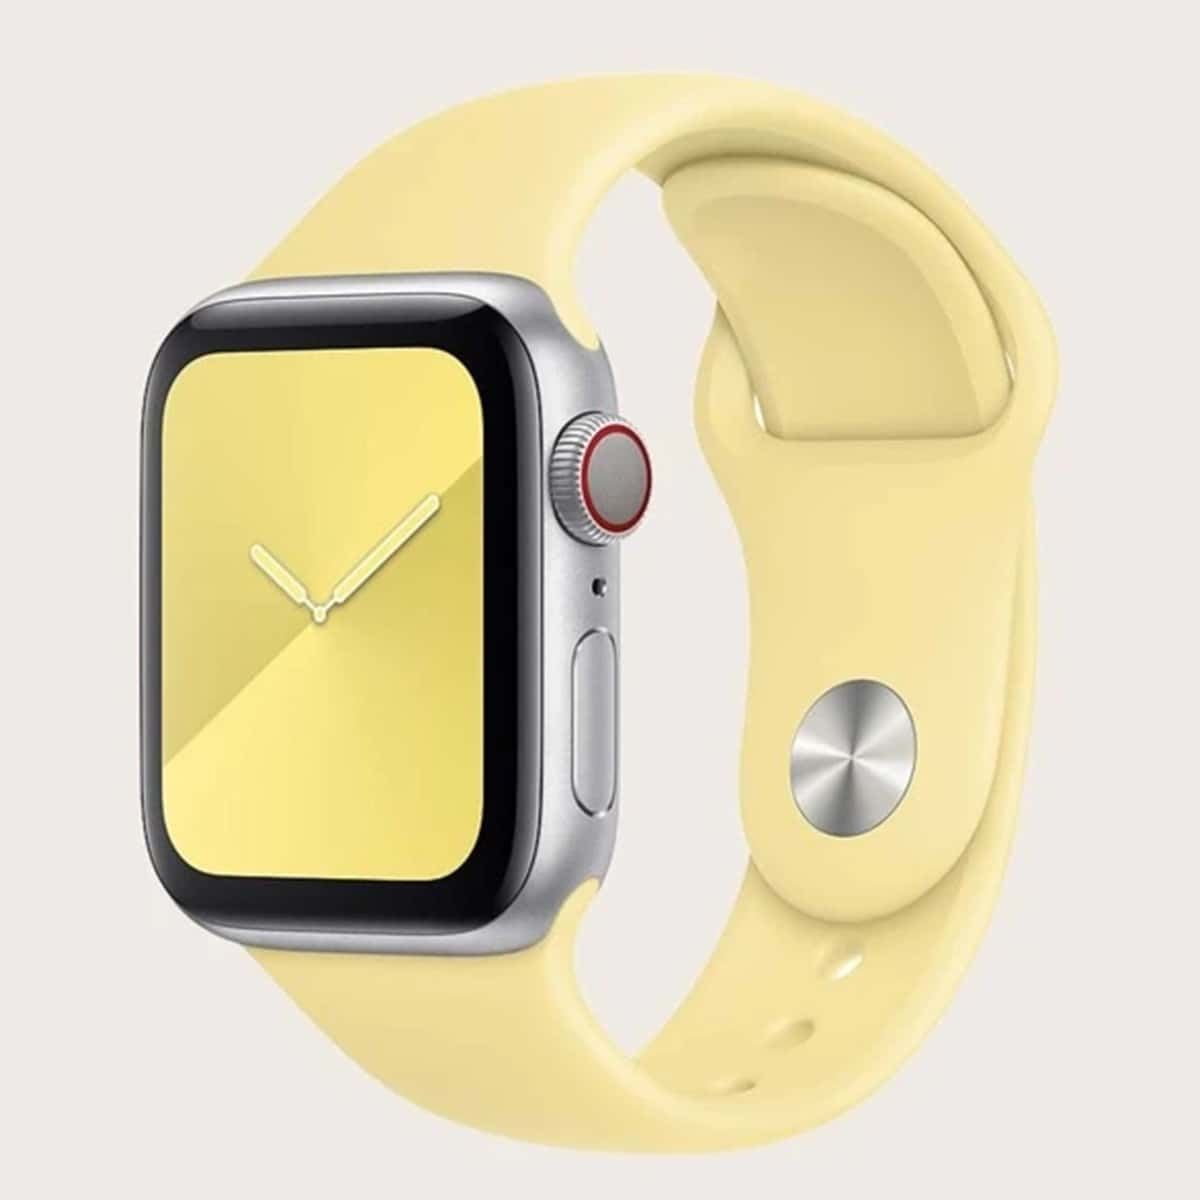 SHEIN / IWatch Armband aus Silikon